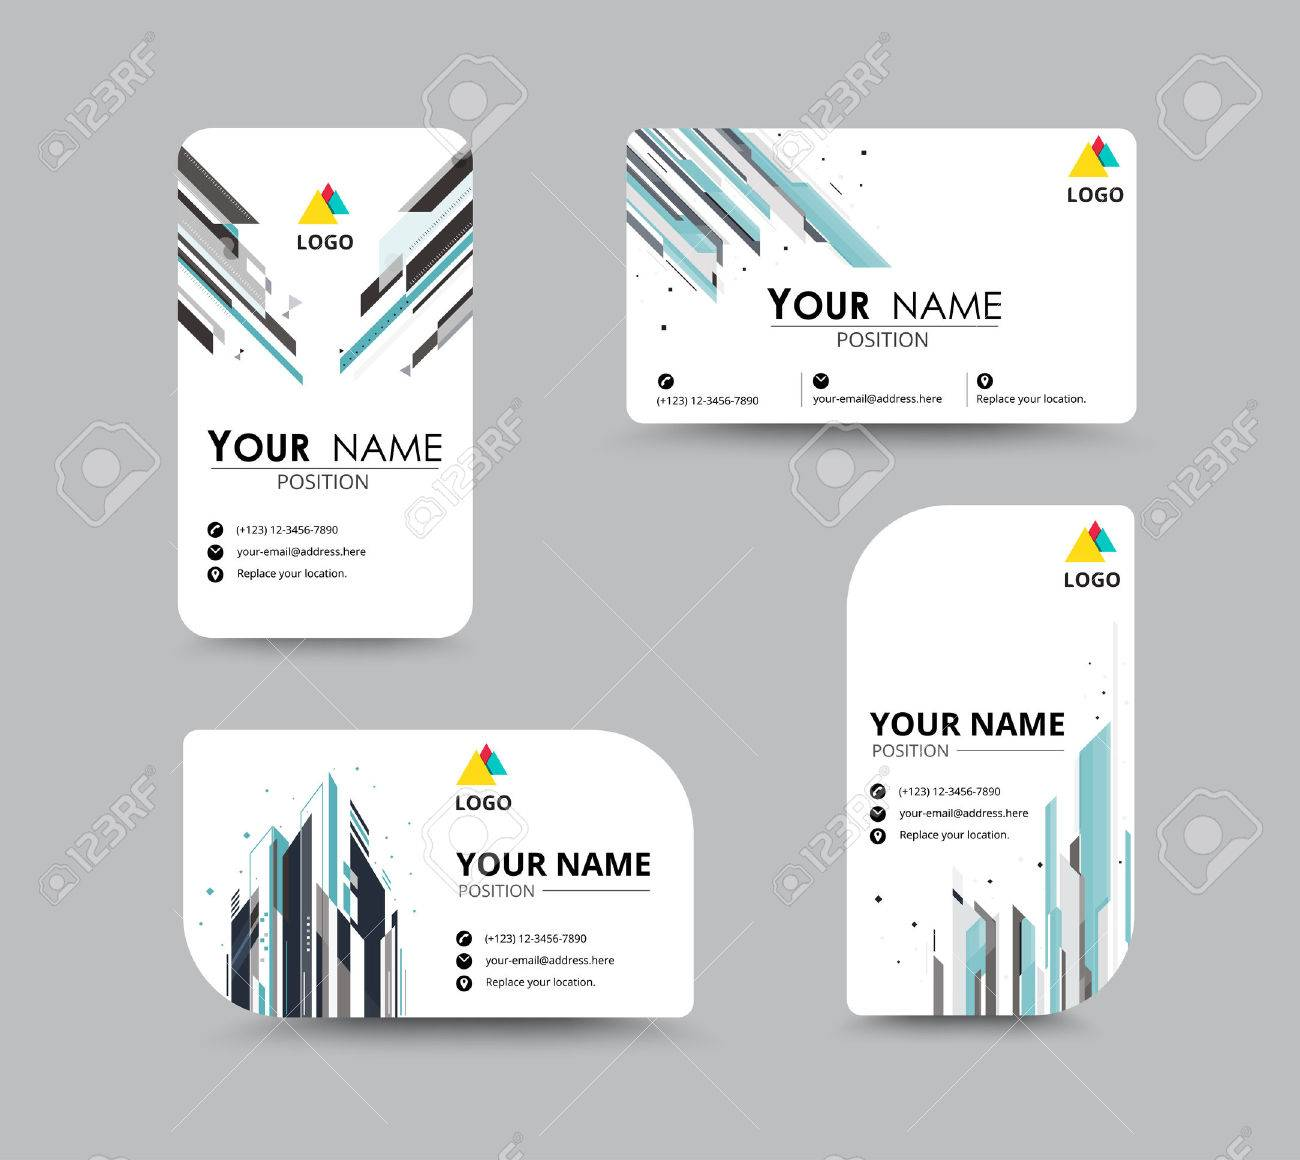 Business greeting card template design introduce card include business greeting card template design introduce card include sample text position vector illustration design m4hsunfo Images